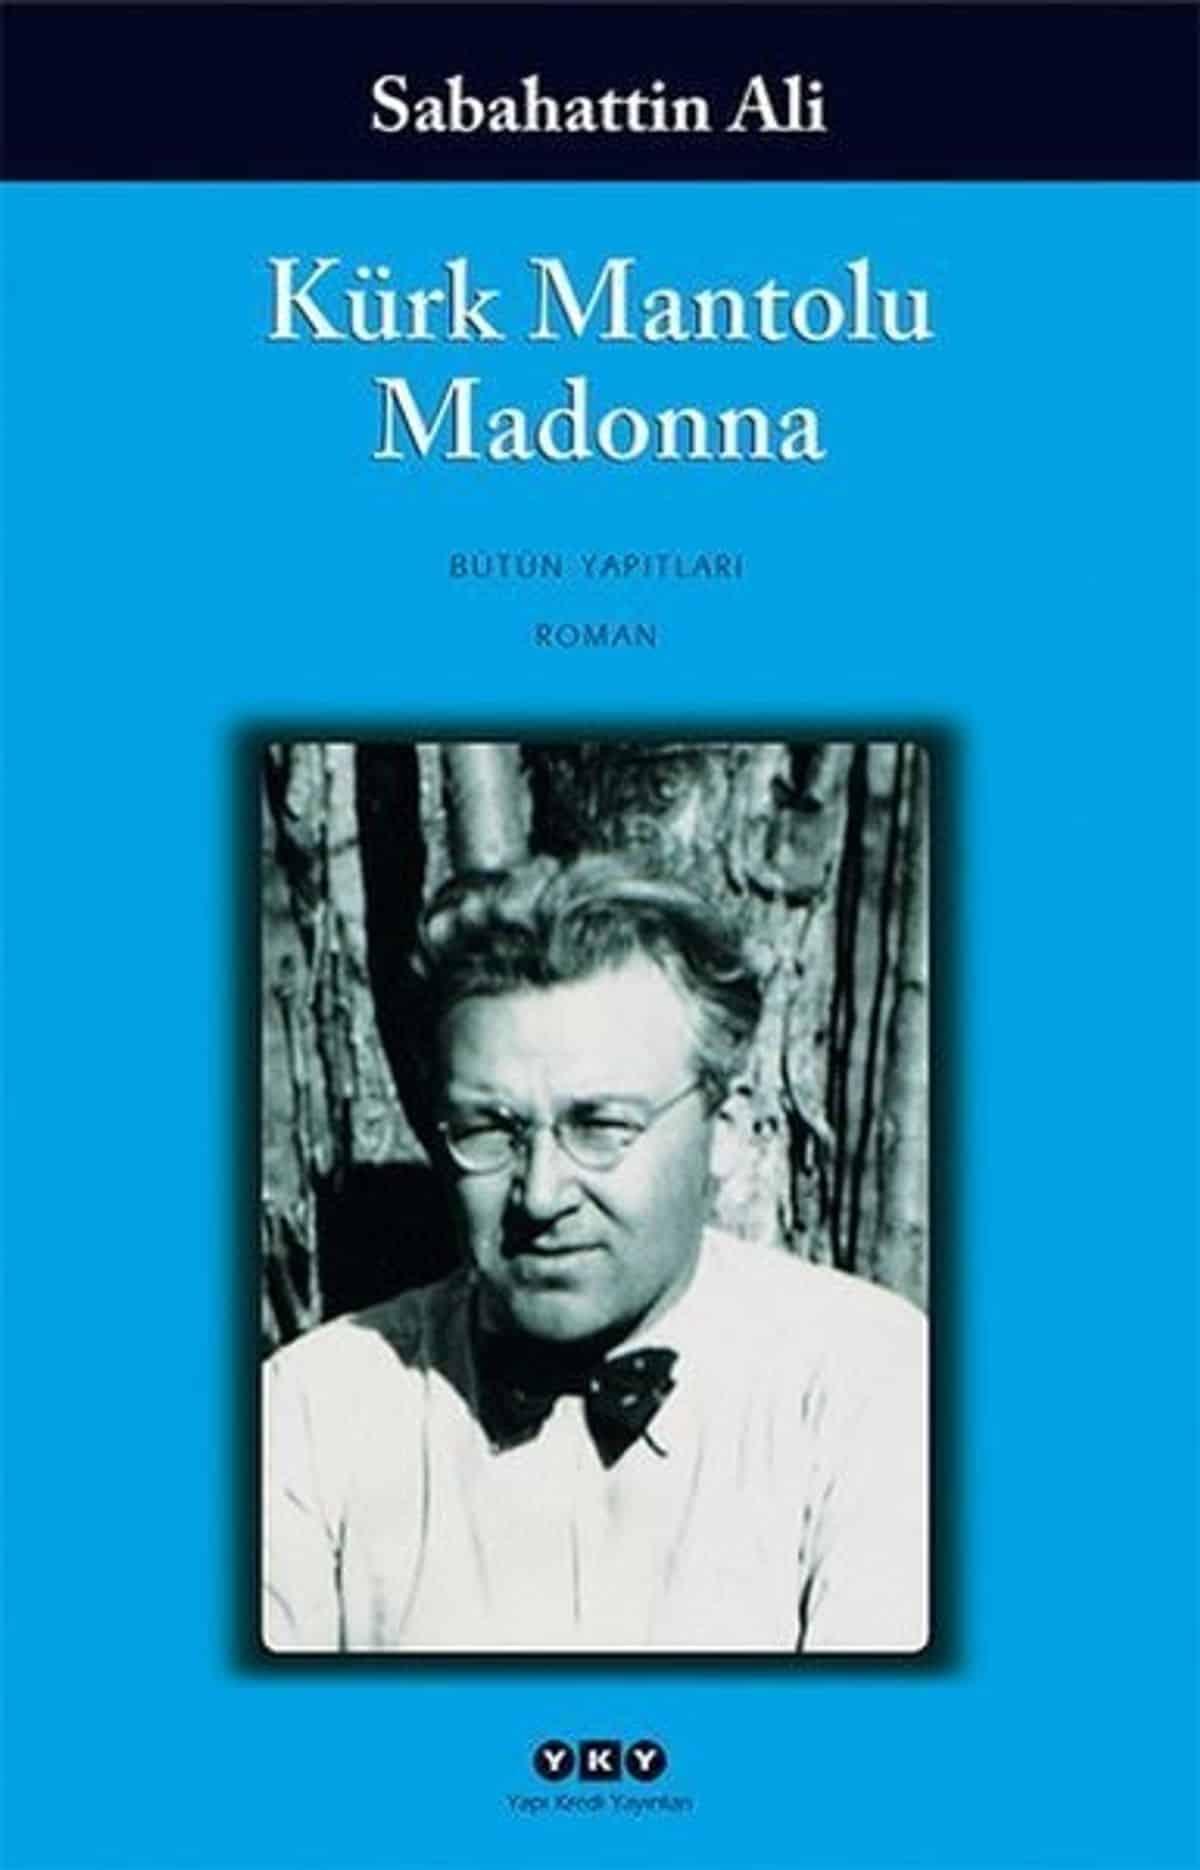 Sabahattin Ali -Kürk Mantolu Madonna